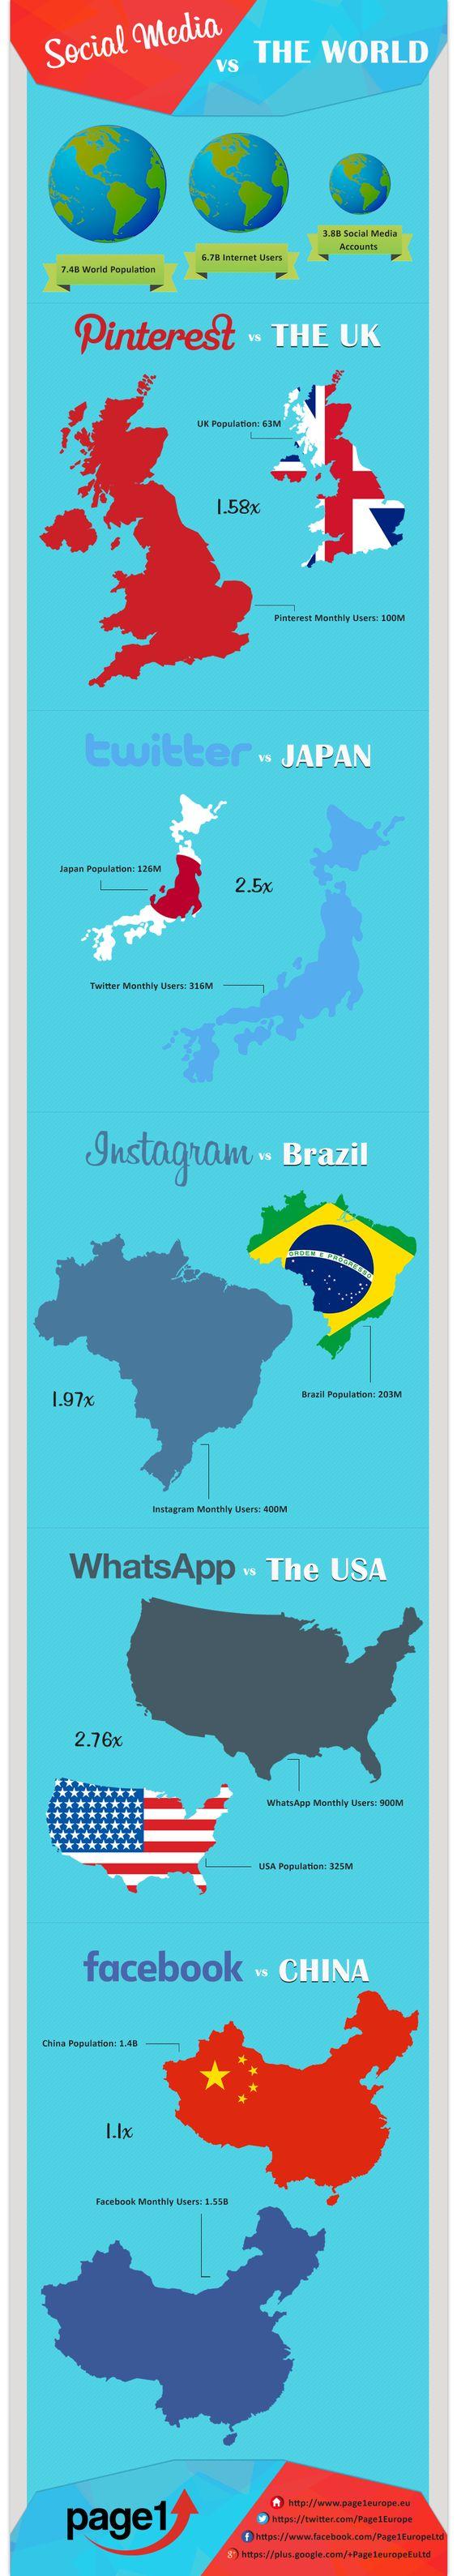 Social Media vs The World